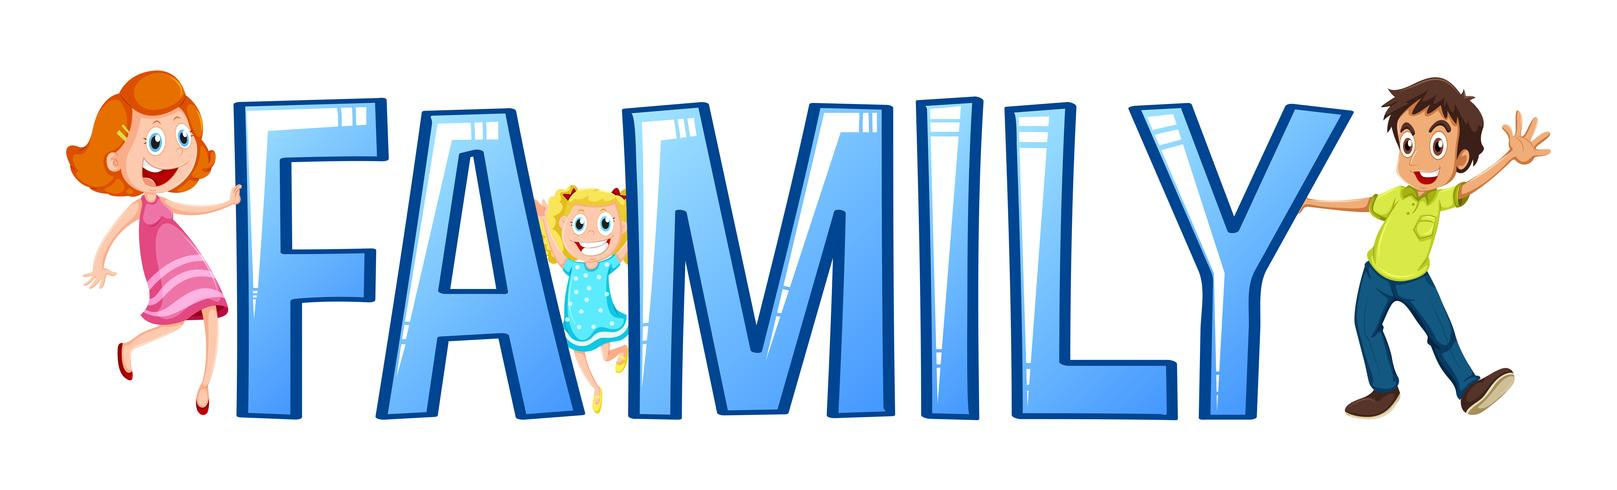 Font design for word family